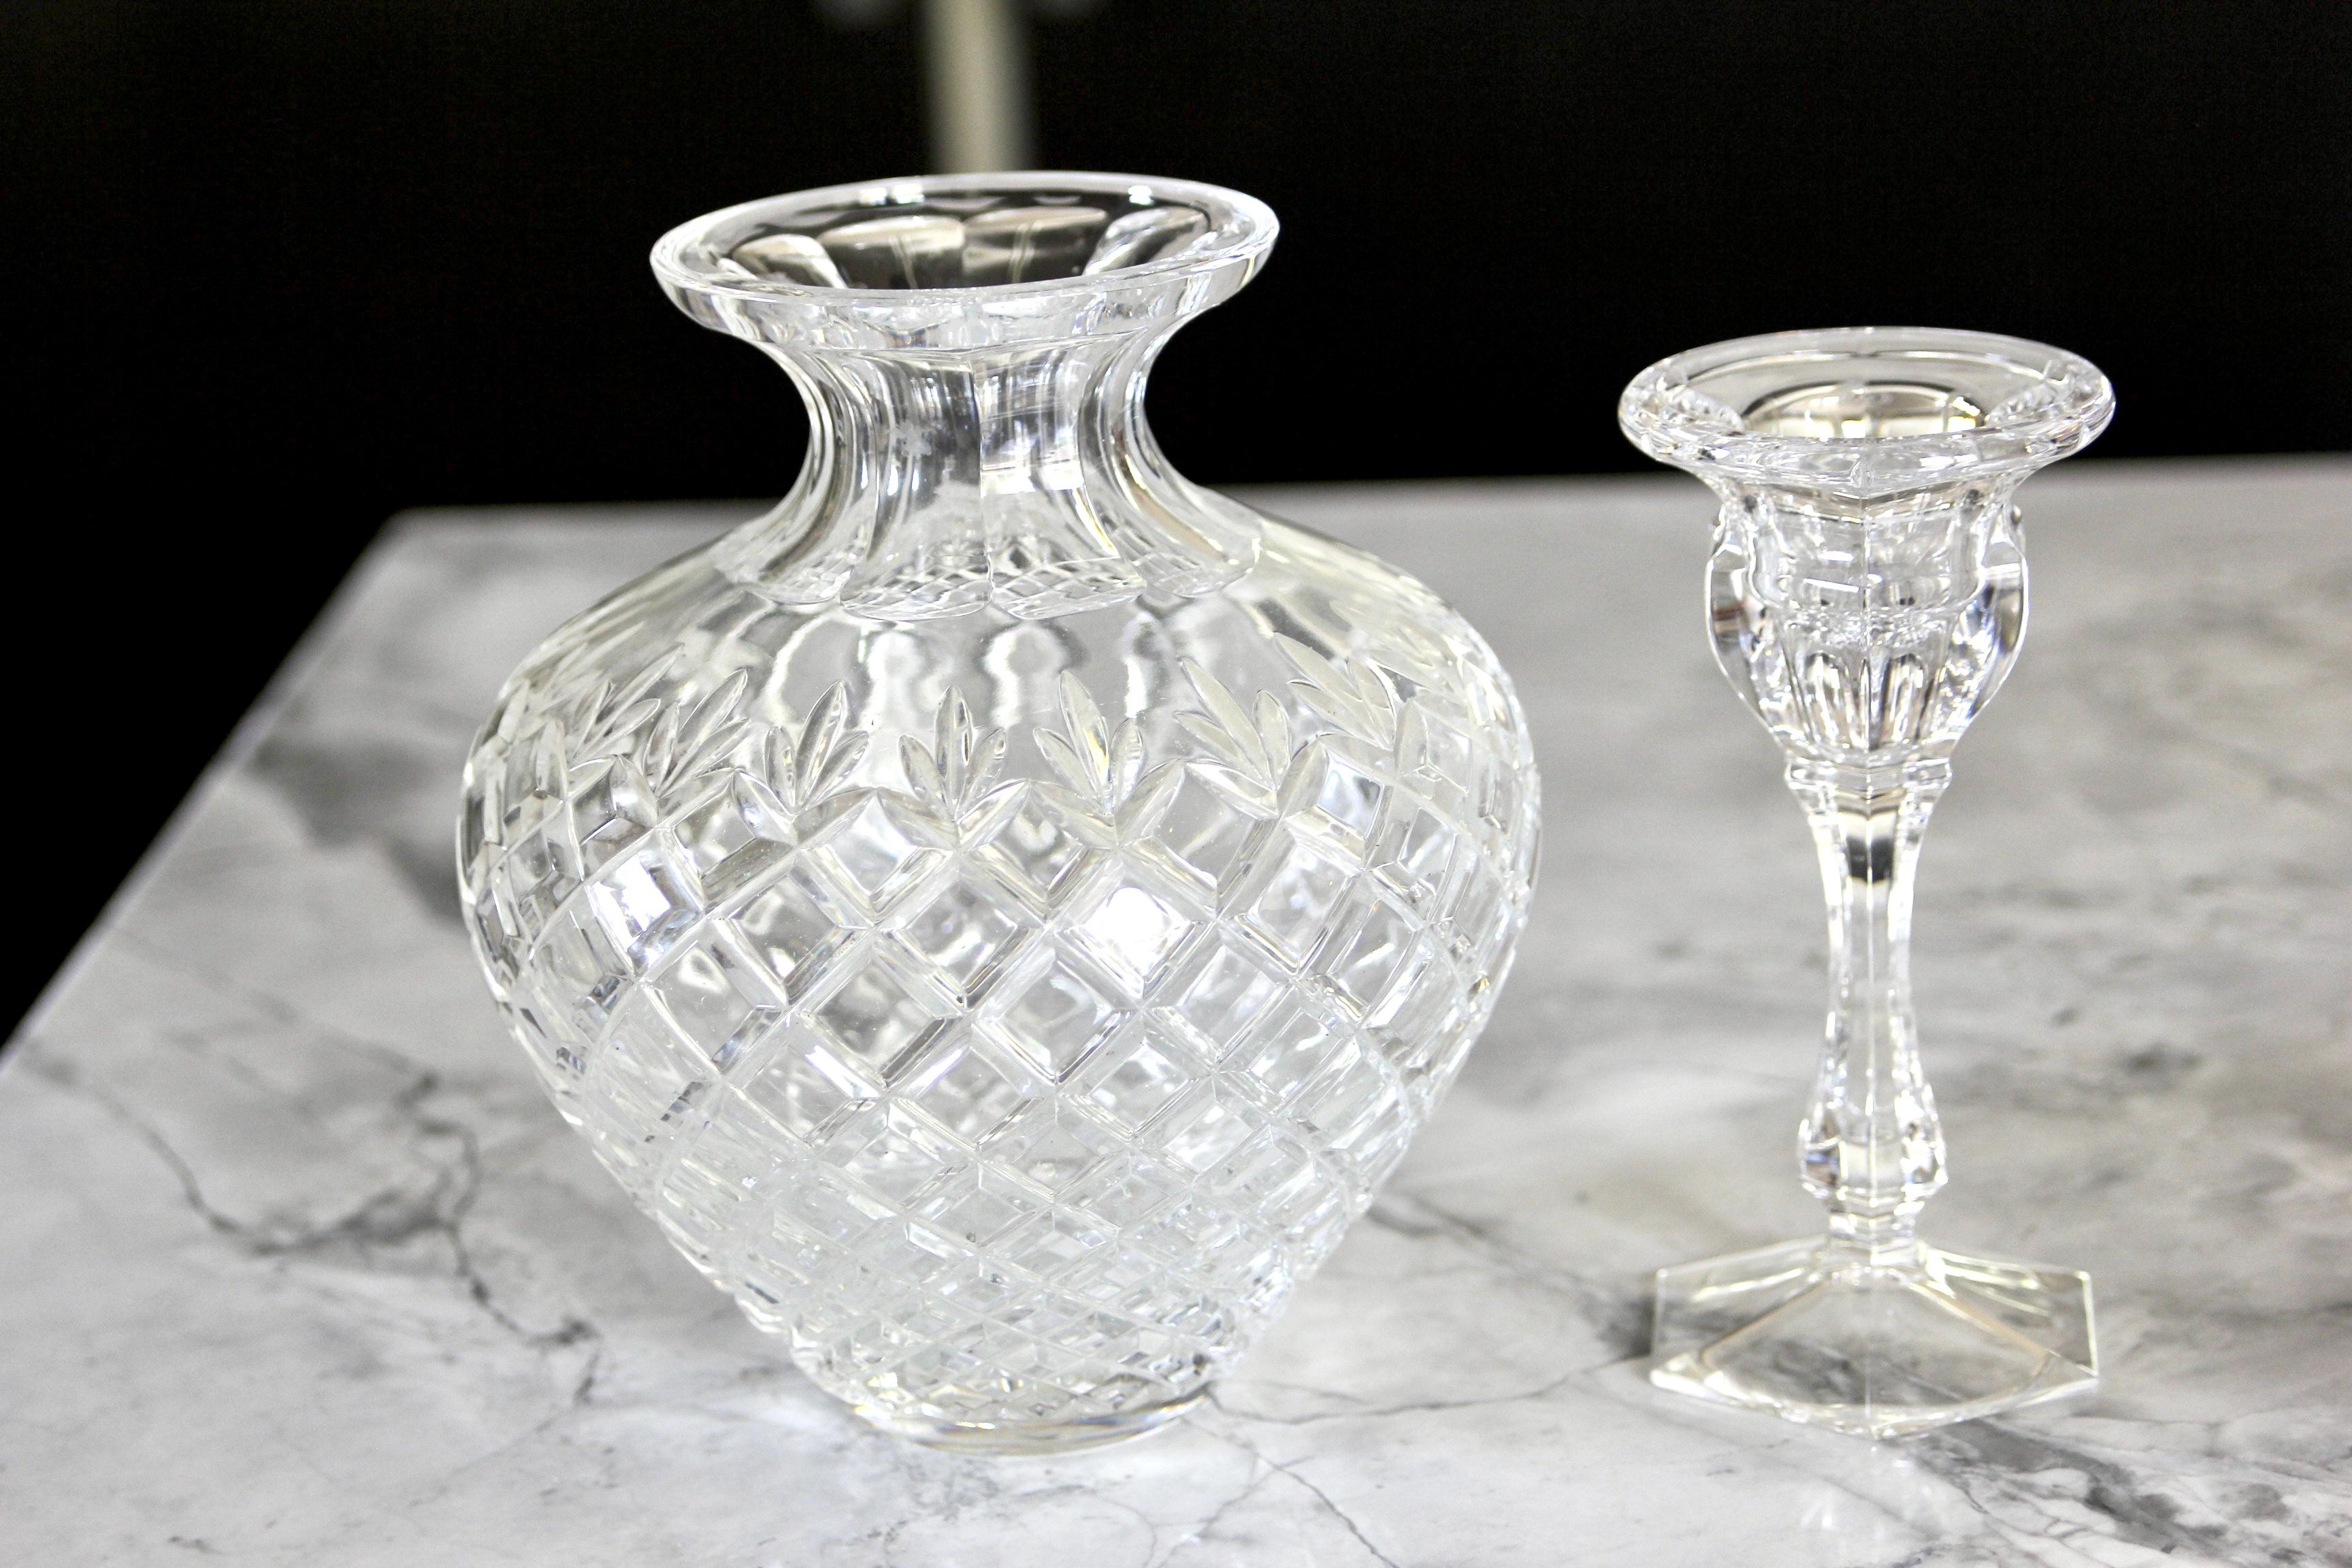 Crystal vase & candlestick